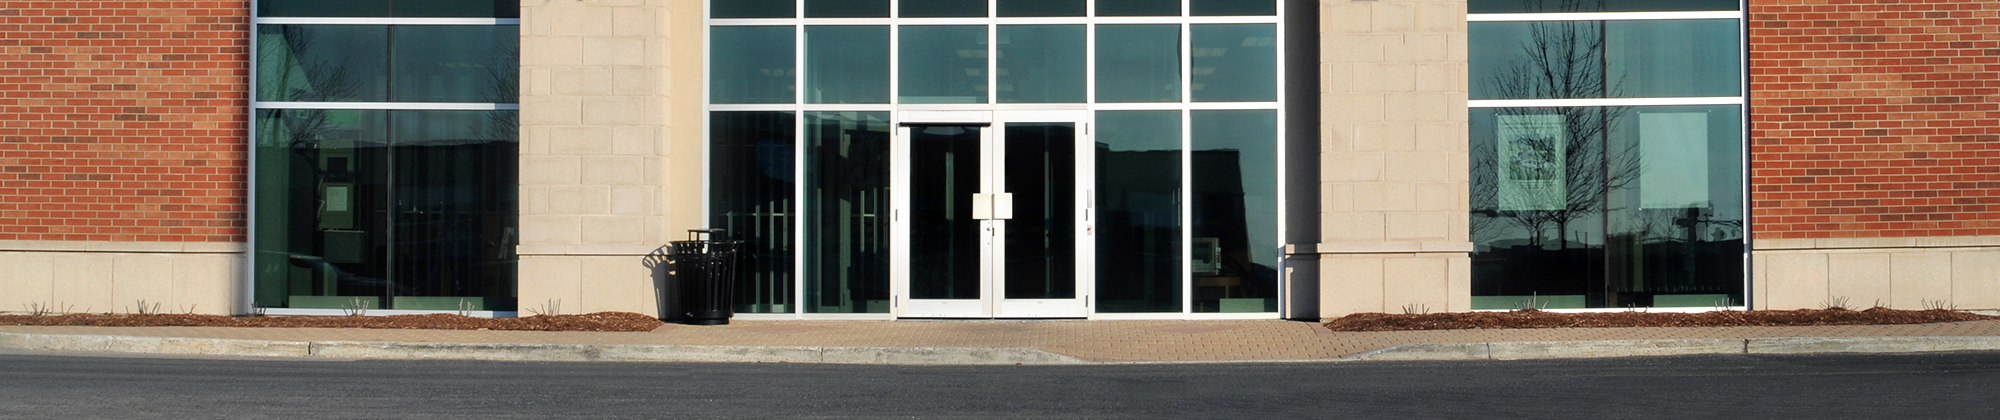 Personal Financial Management Advisors Evansville